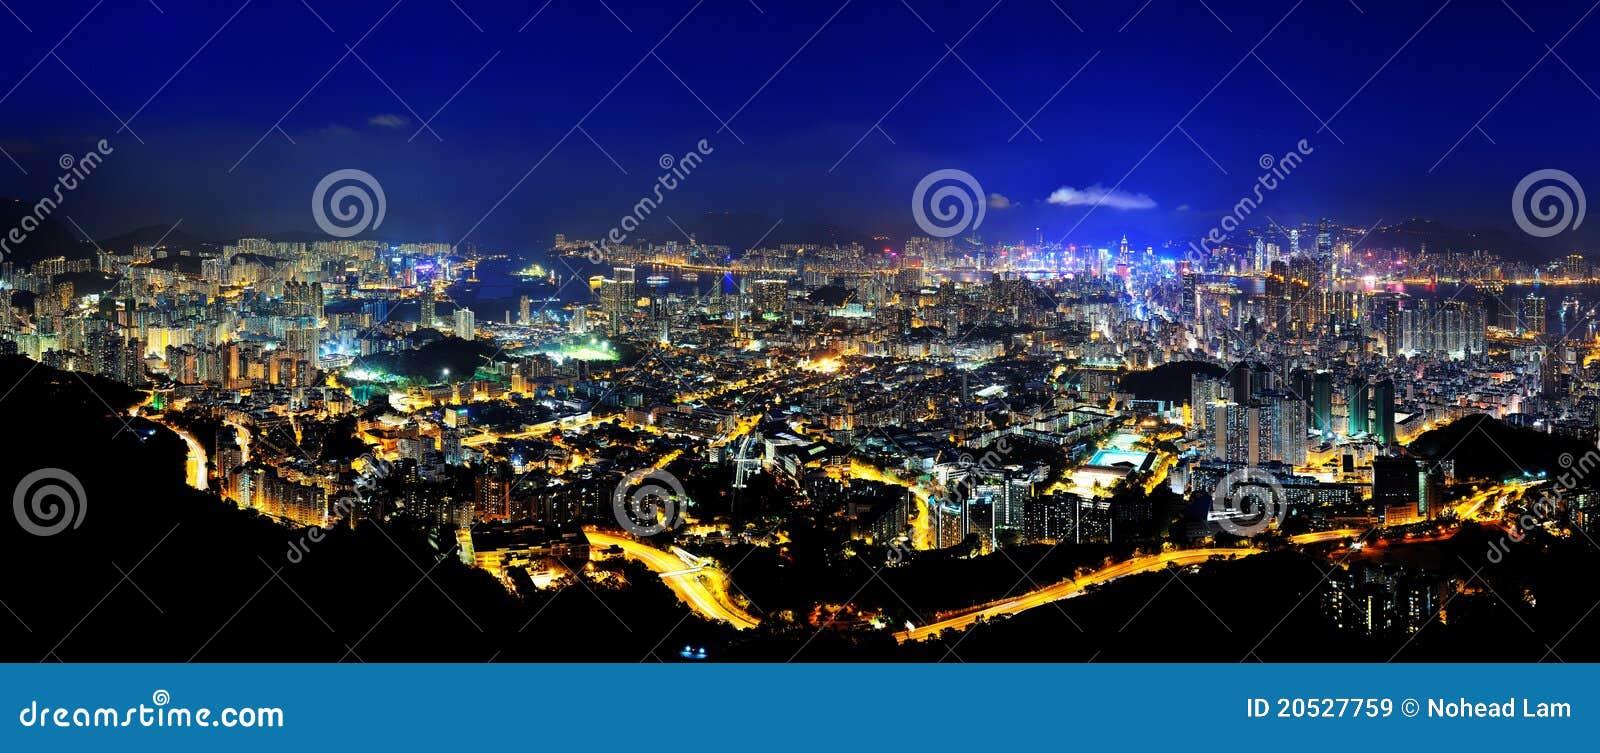 Download Night Scenes Of Hong Kong Panoramic Stock Image - Image of kowloon, dusk: 20527759